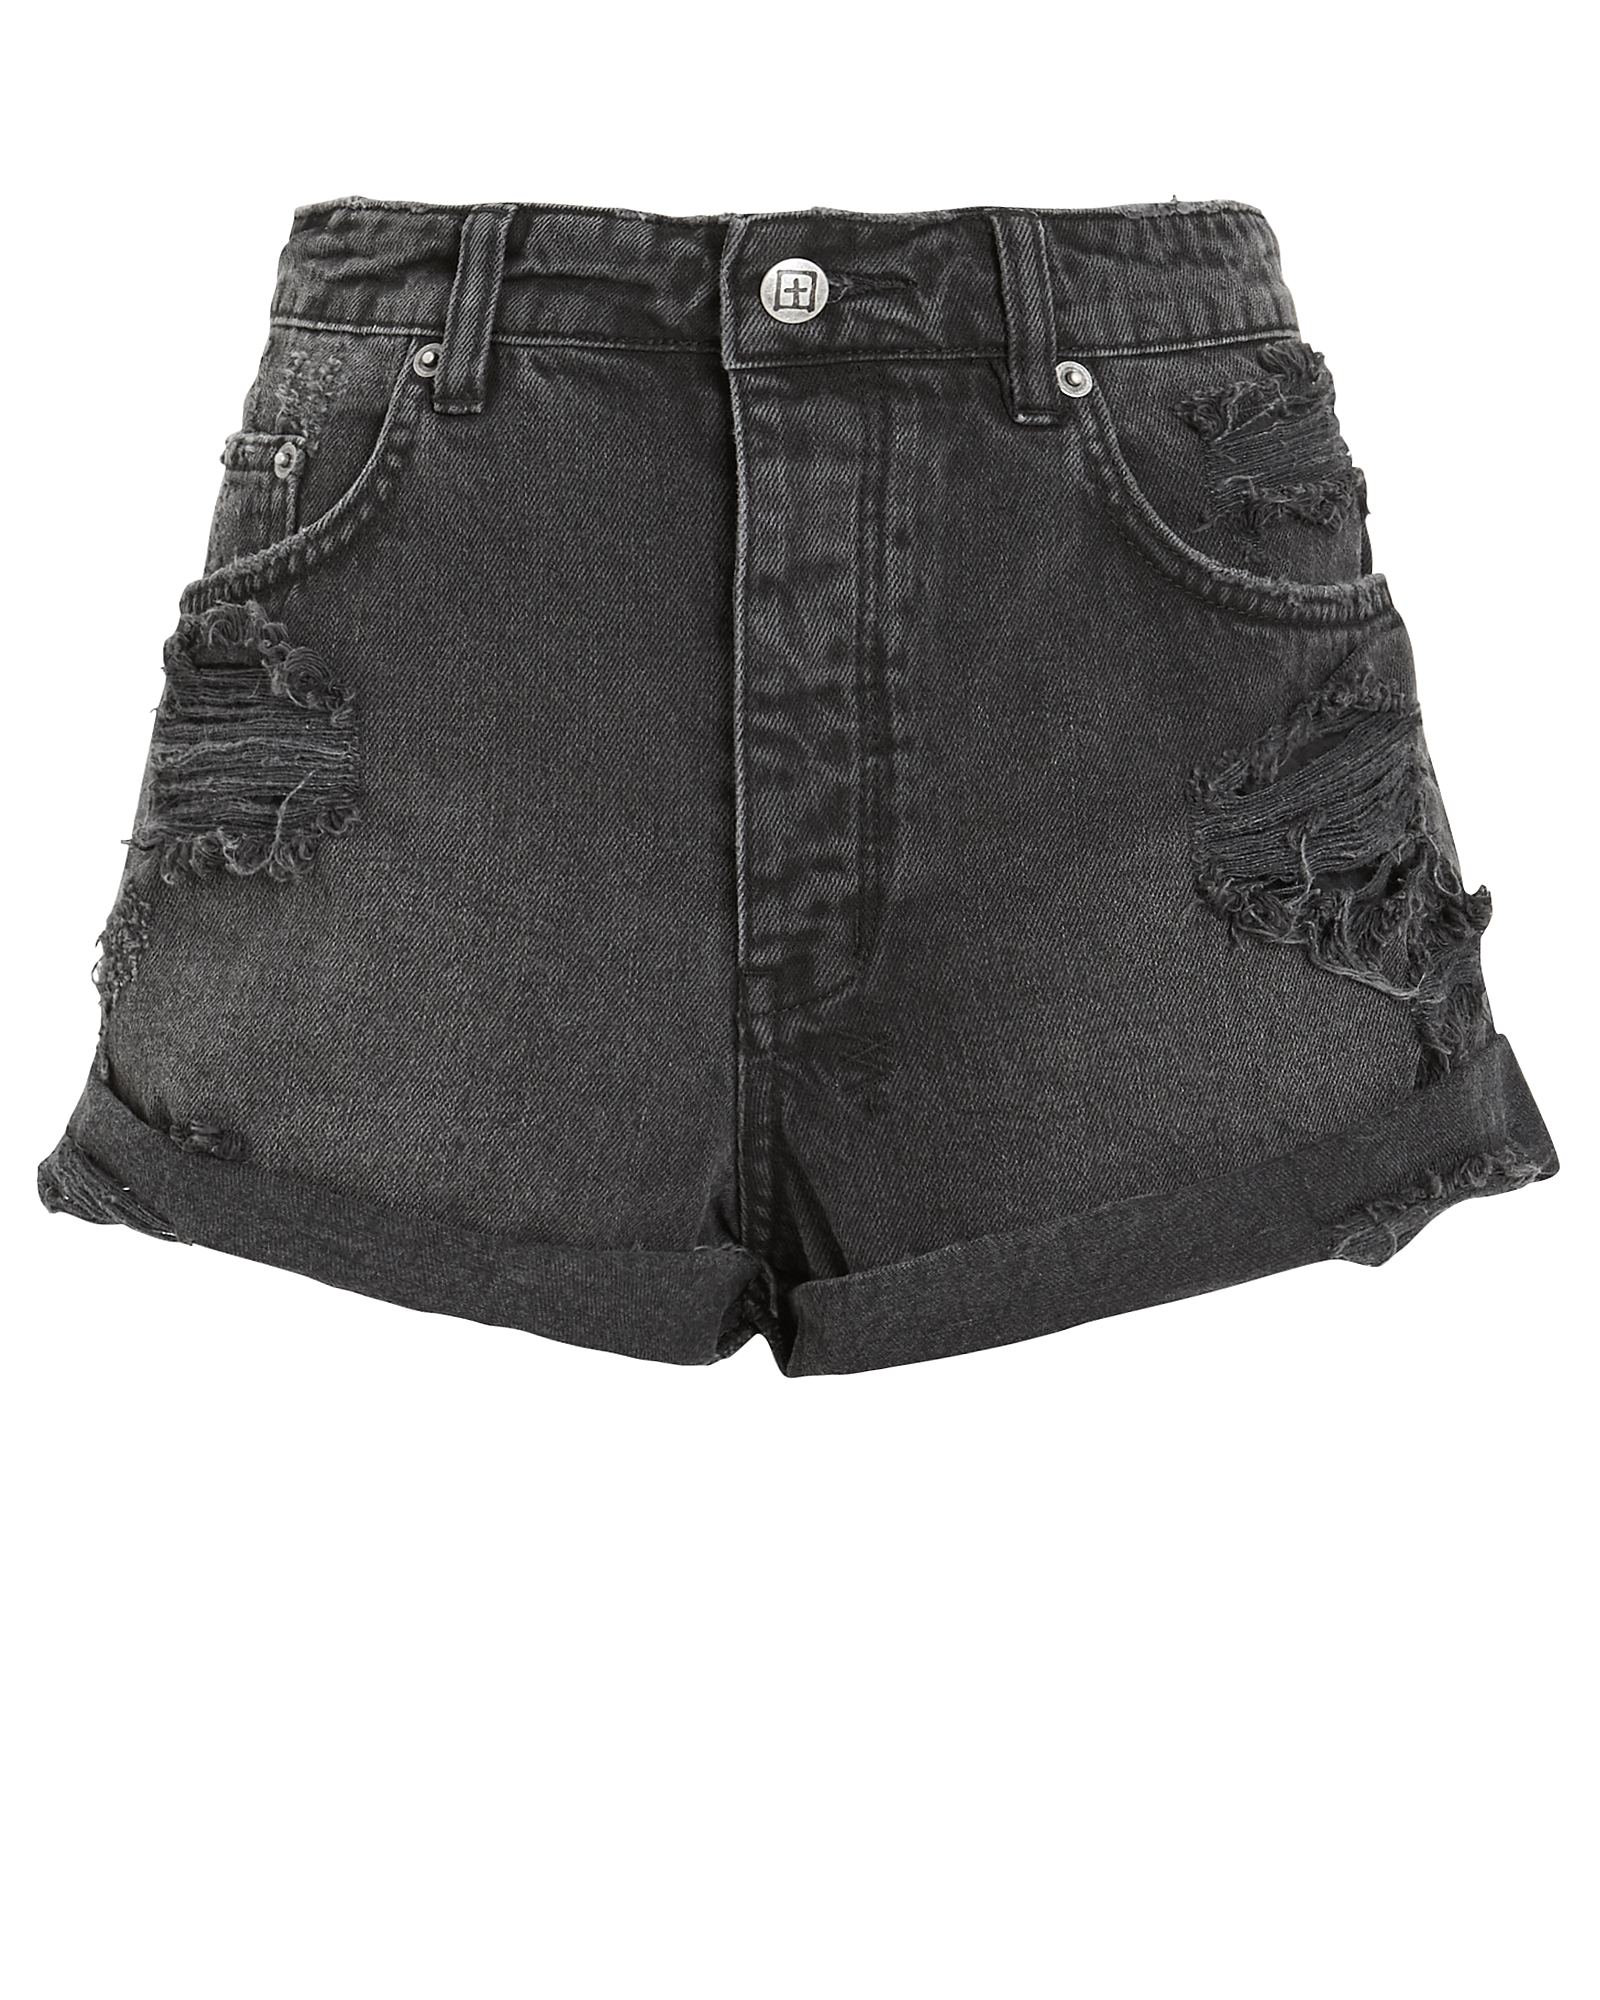 Rollin Out Denim Shorts by Ksubi